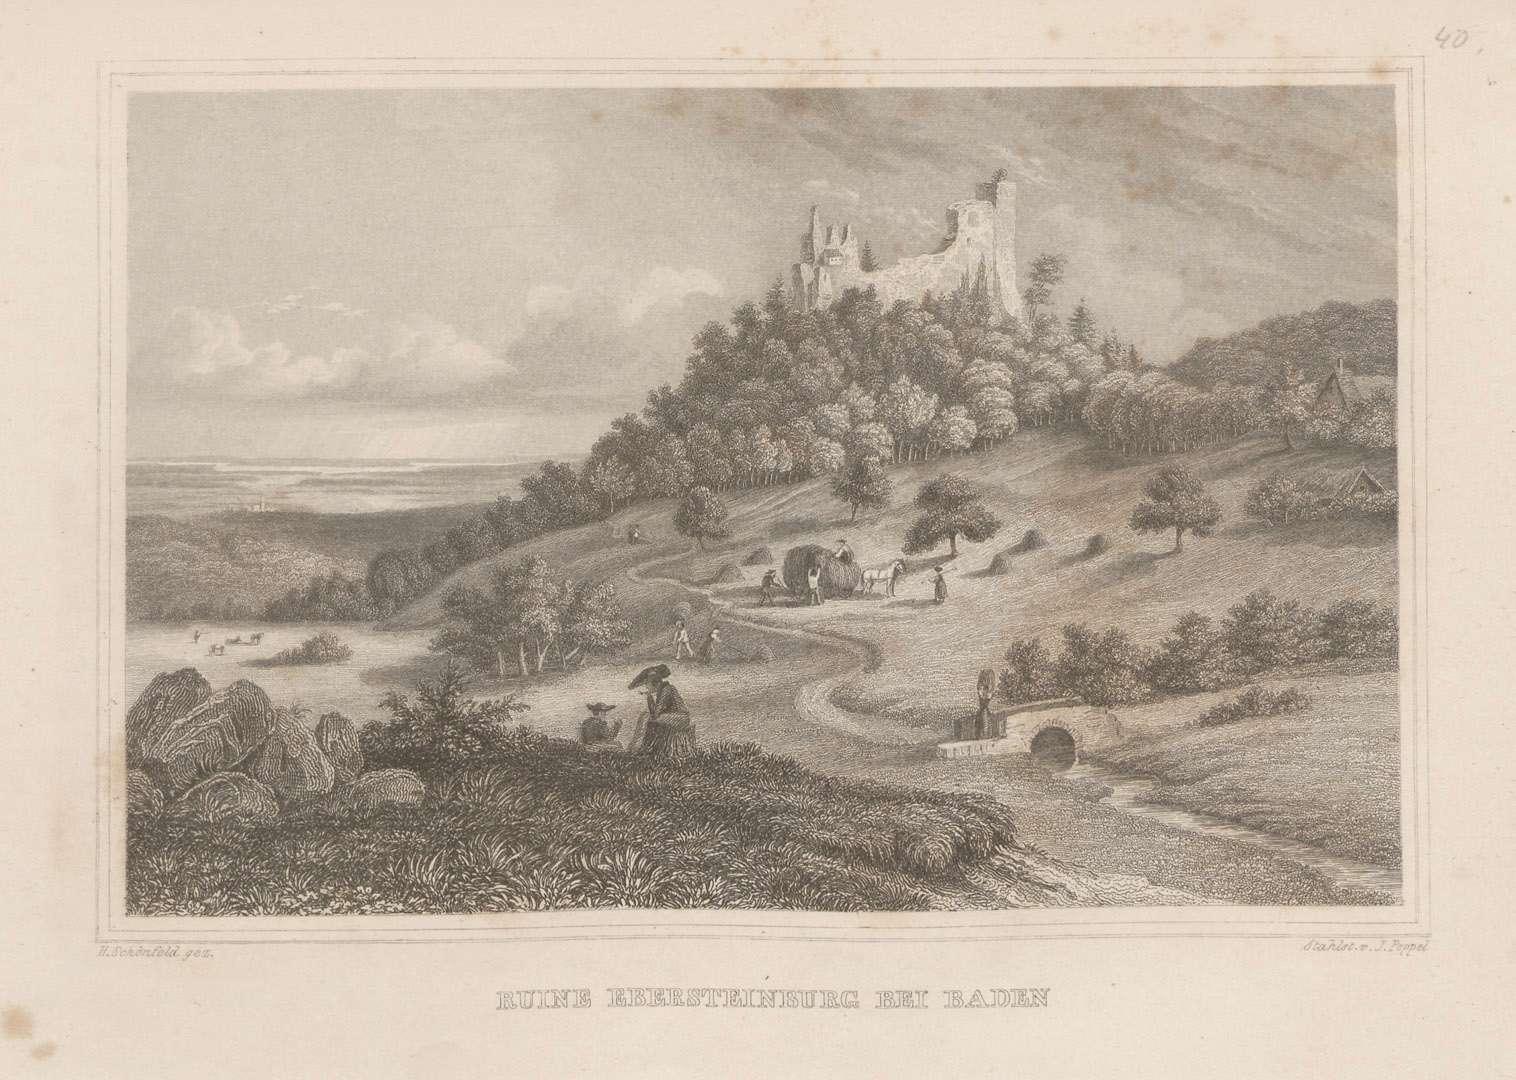 Ruine Ebersteinburg bei Baden[-Baden], Bild 1